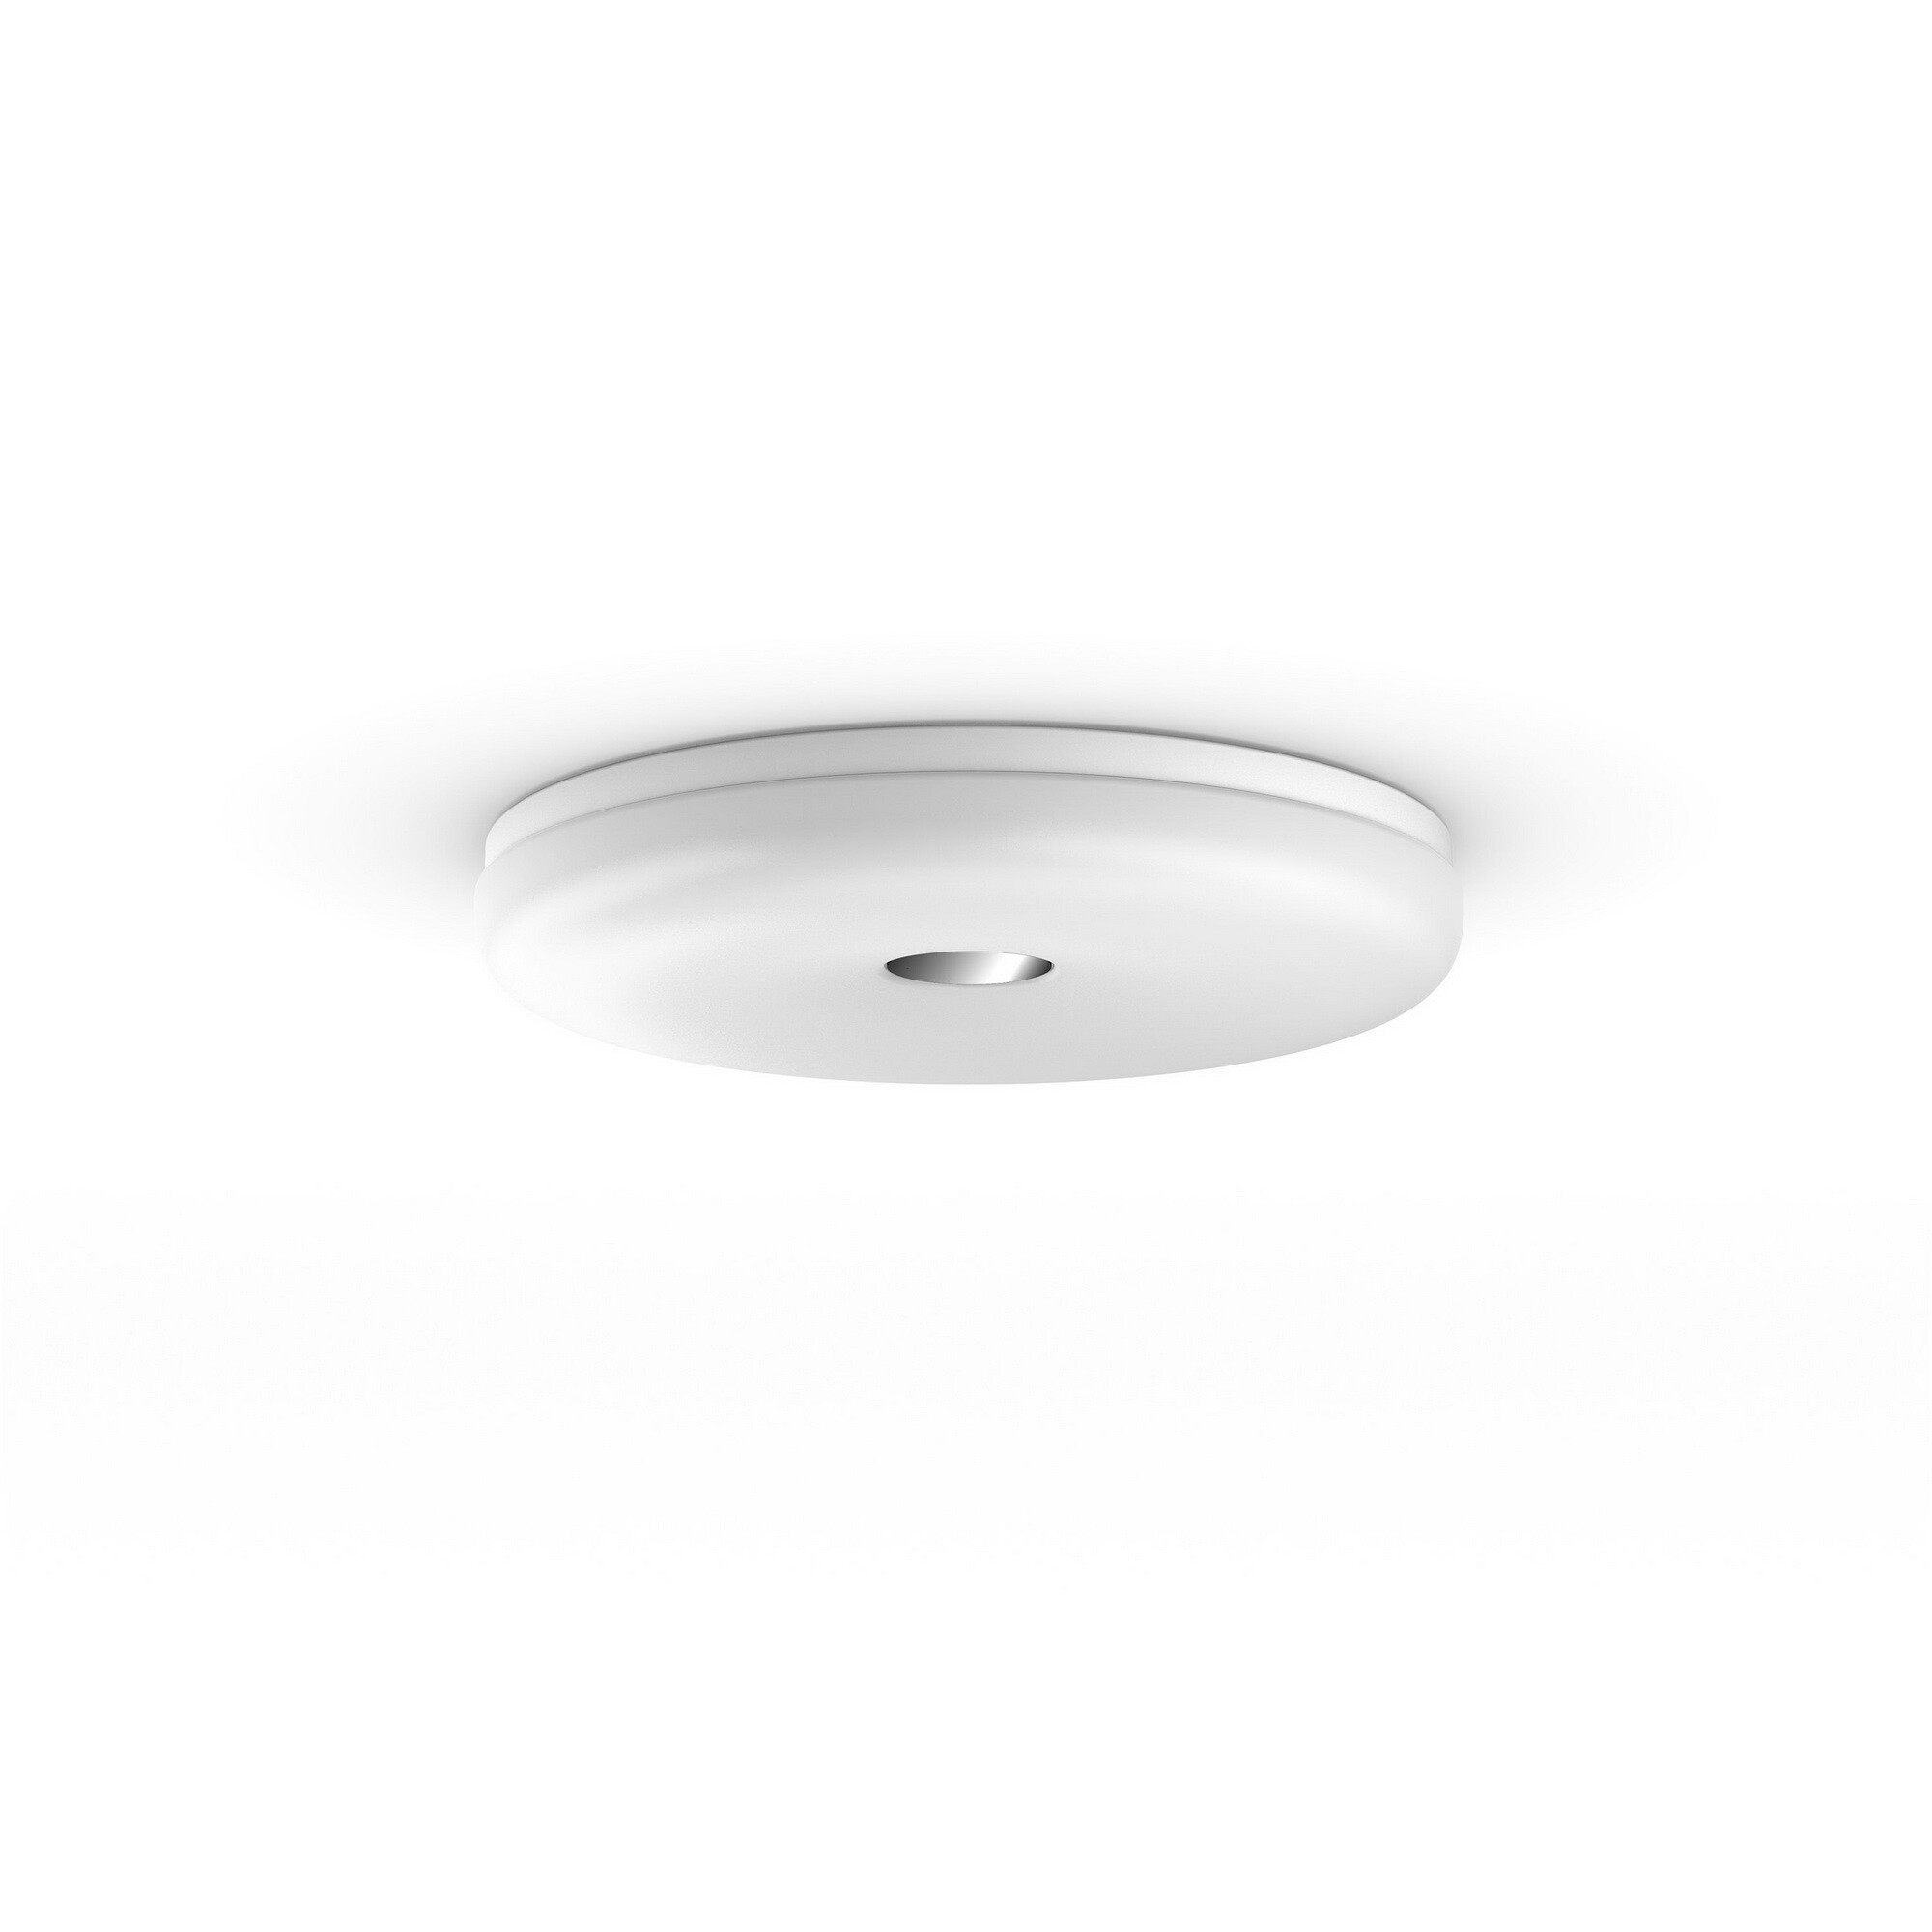 Philips HUE STRUANA Plafonnier LED 1x39W/2400lm Blanc